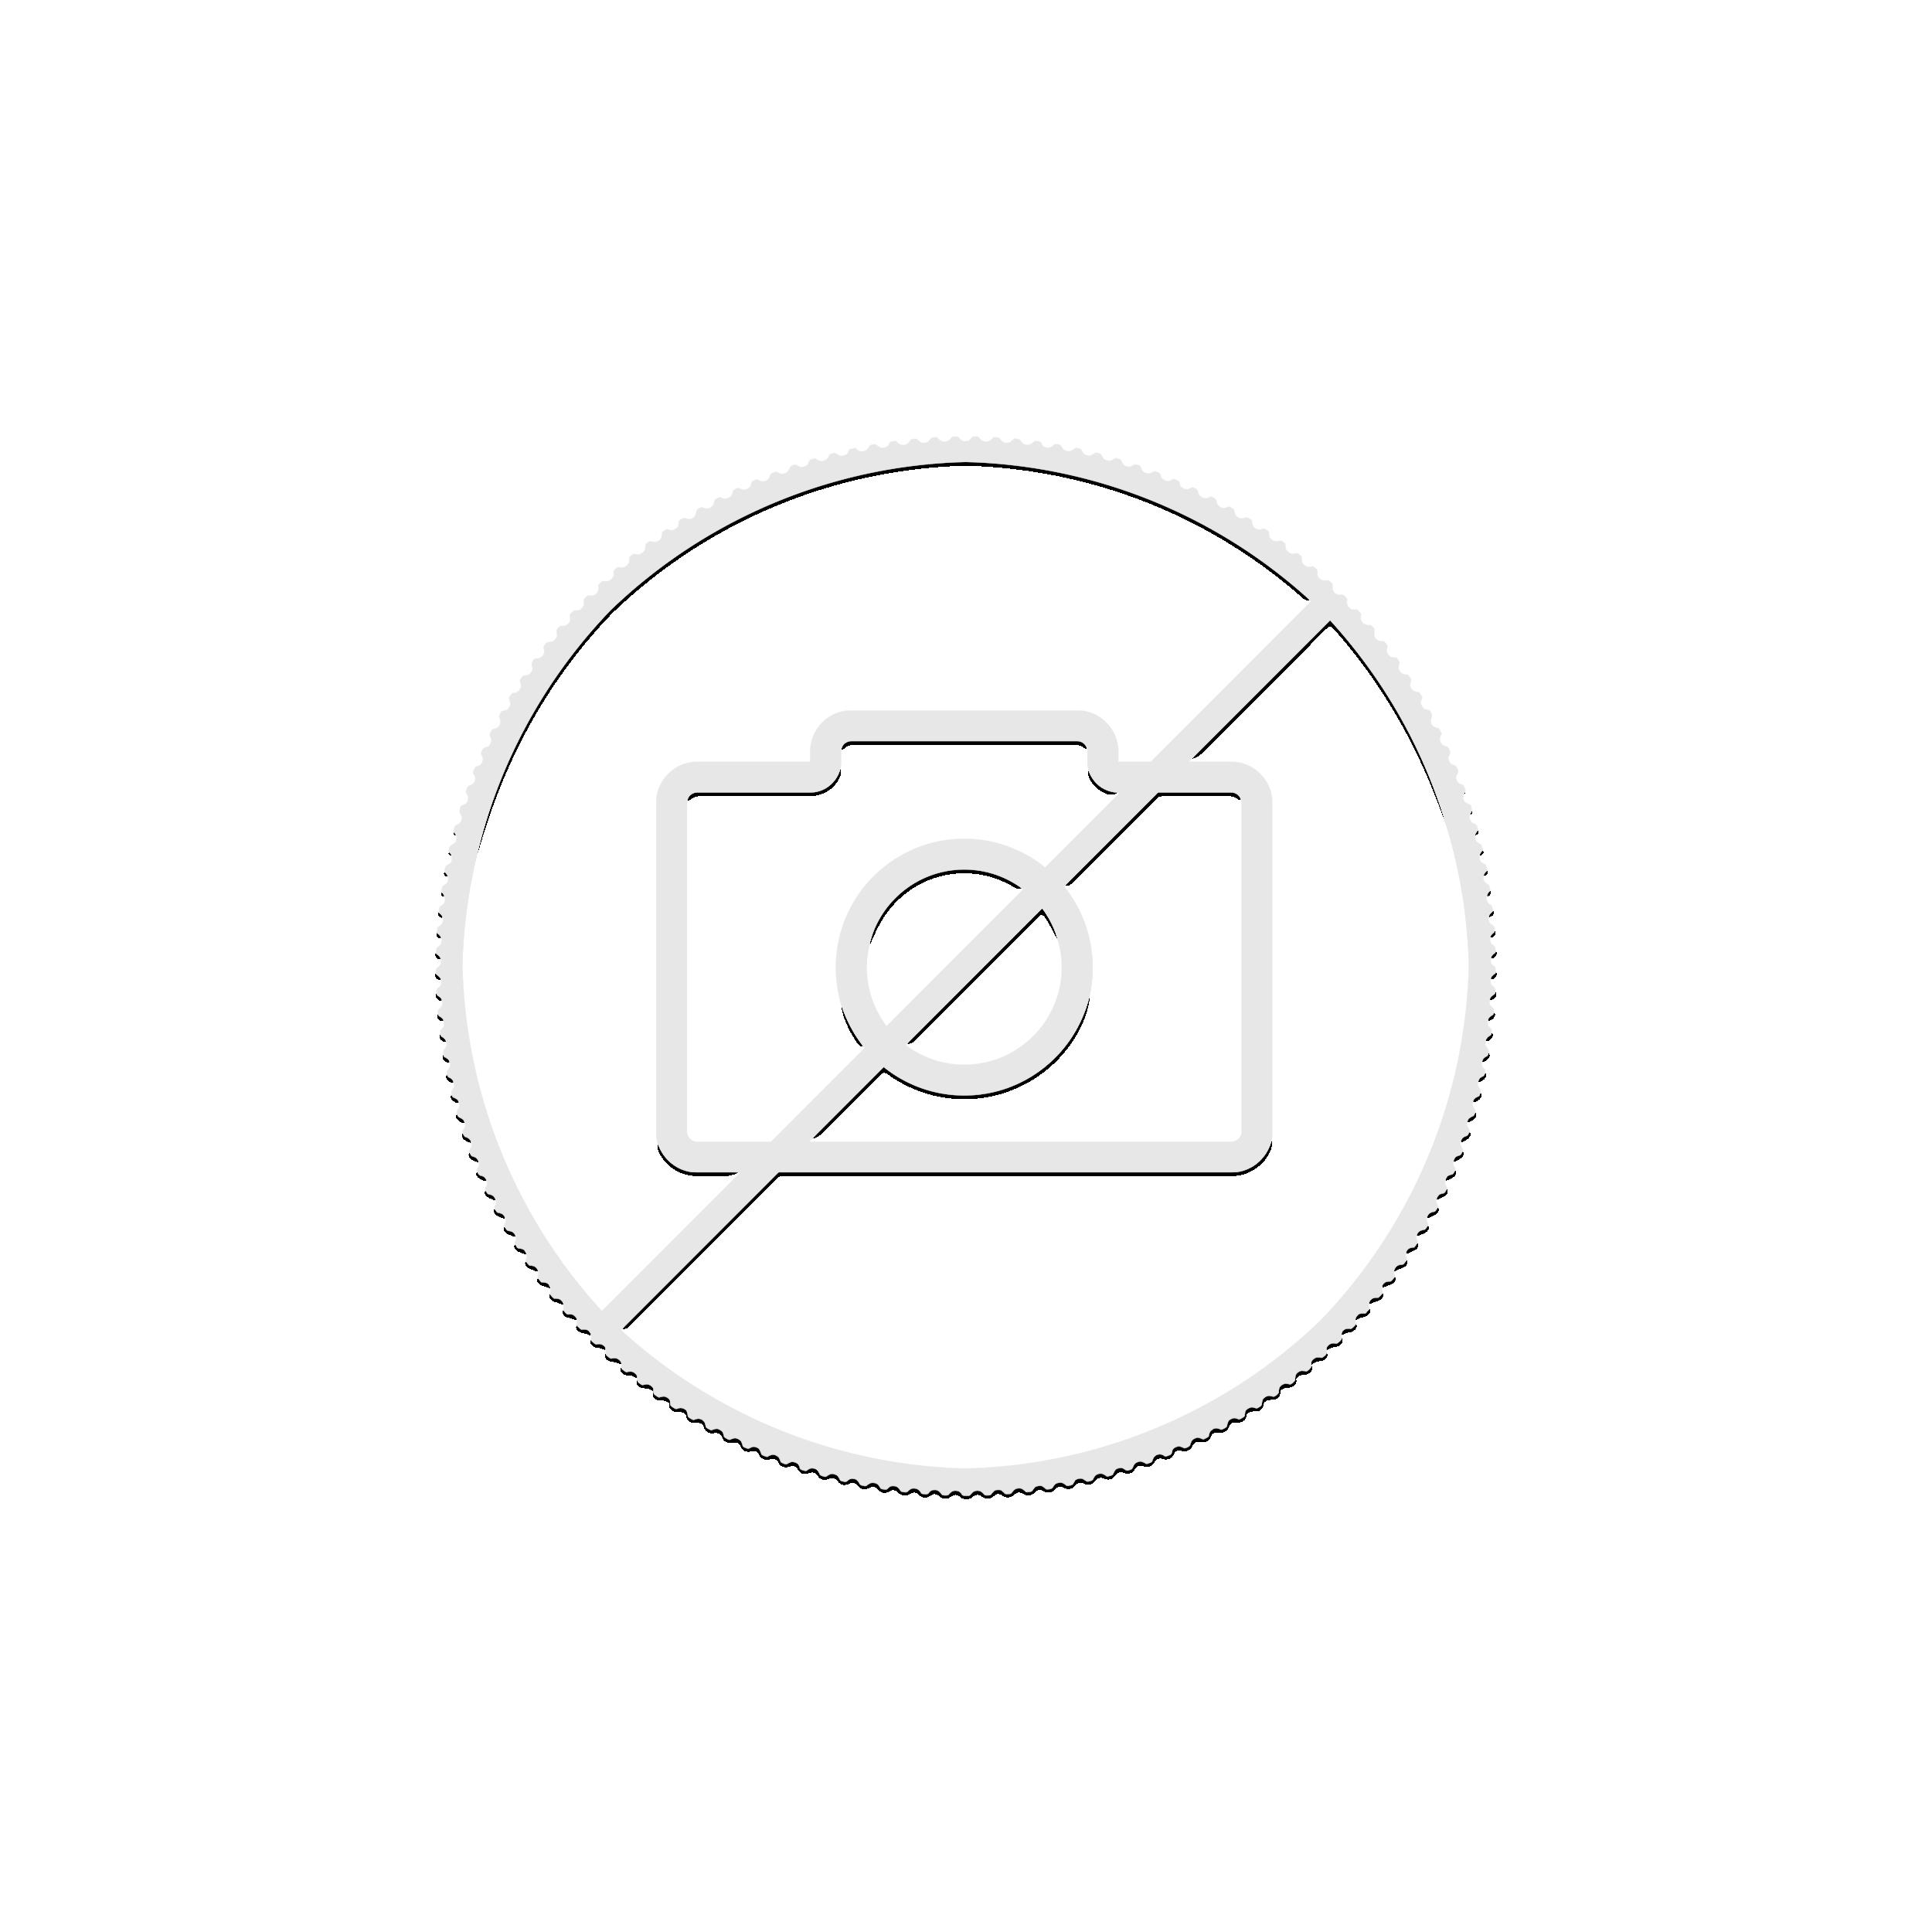 1 Troy ounce gouden munt UK Lunar 2015